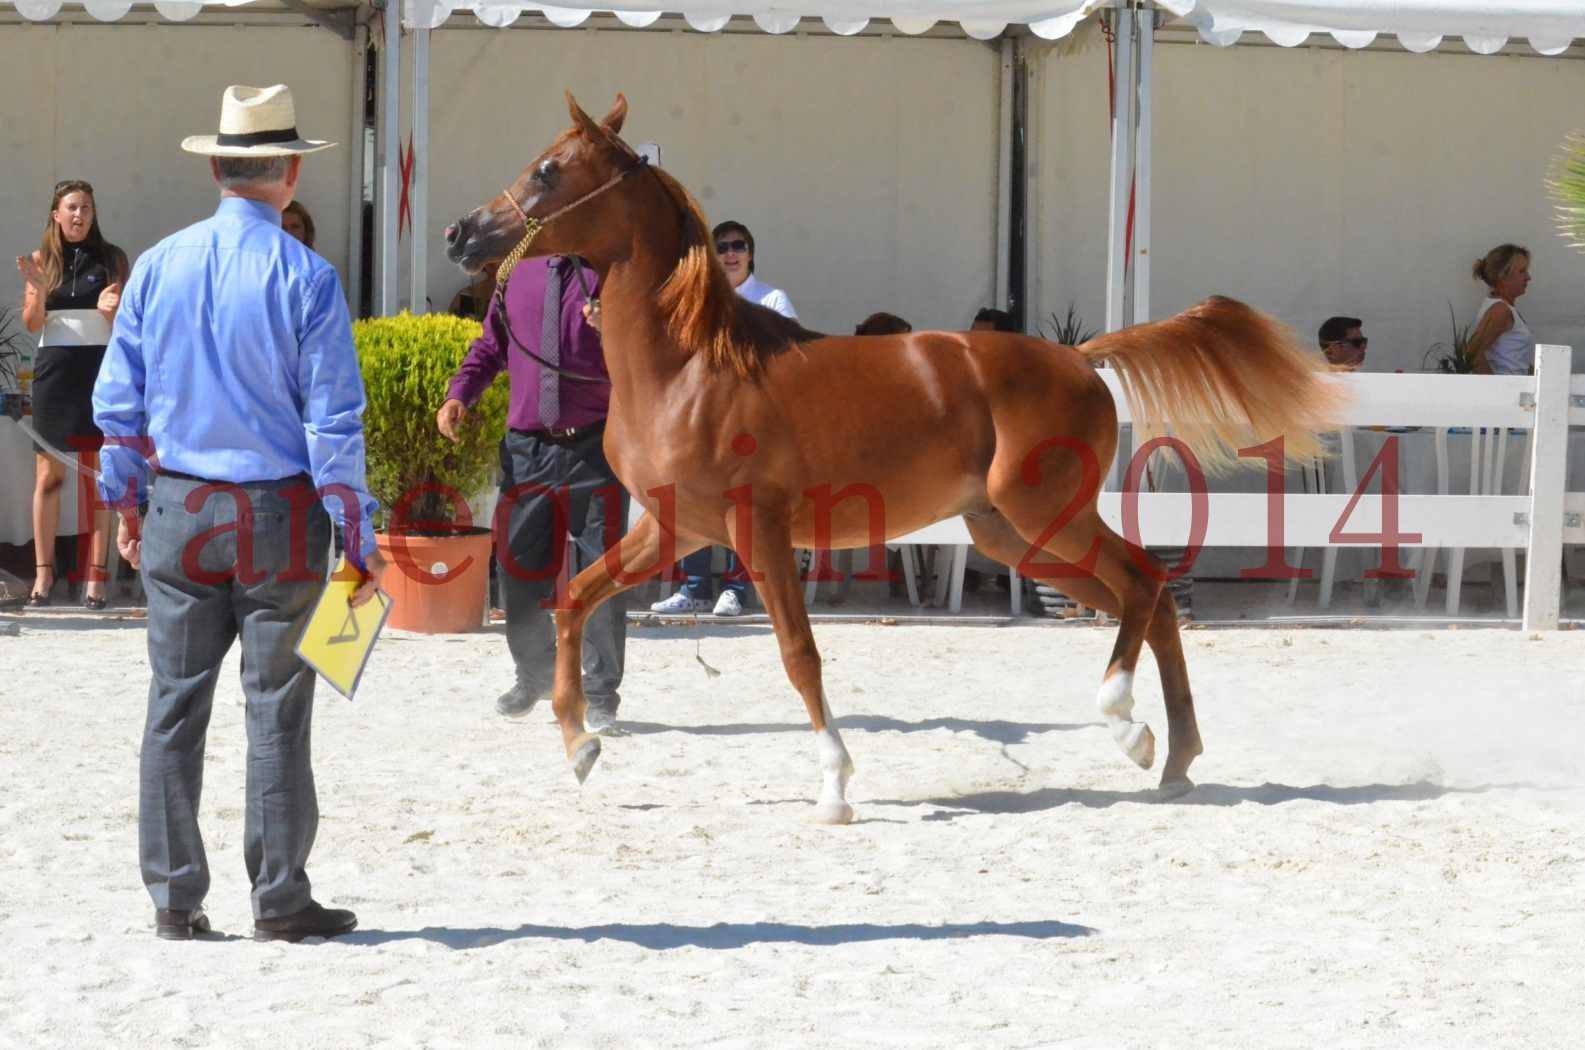 Concours National de Nîmes de chevaux ARABES 2014 - TSAR NERIO - 05